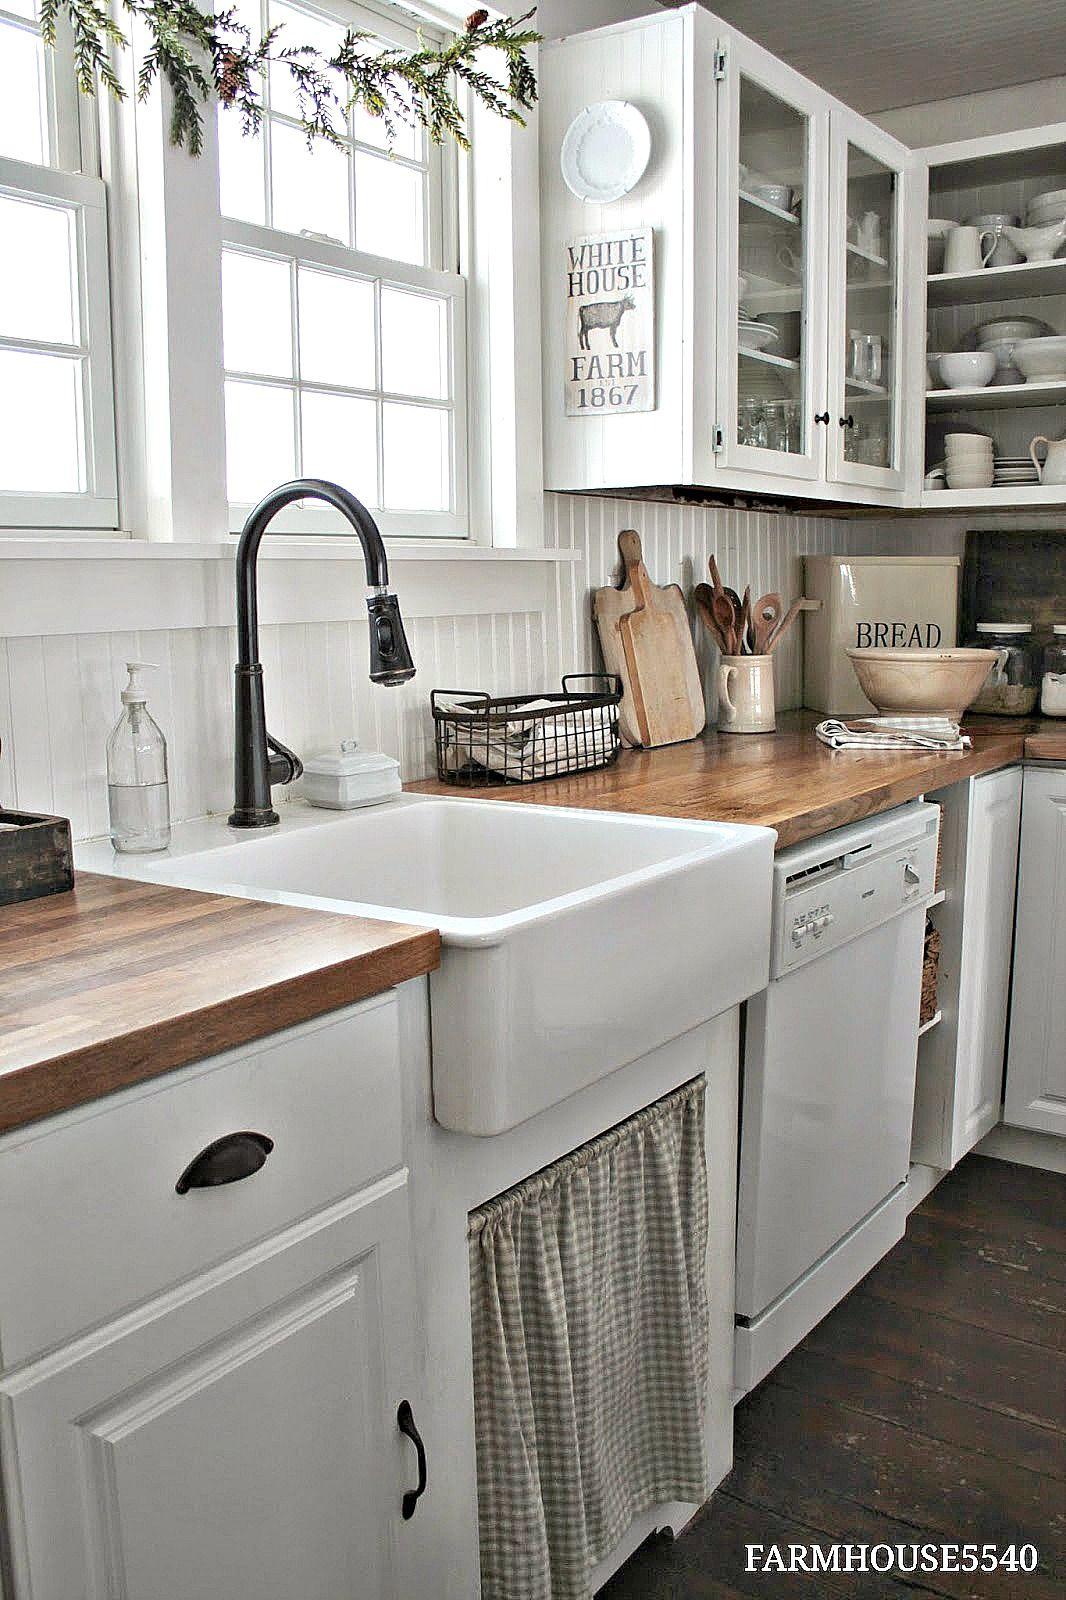 Farmhouse kitchen decor ideas so many beautiful ways to transform your kitchen with authentic farmhouse style